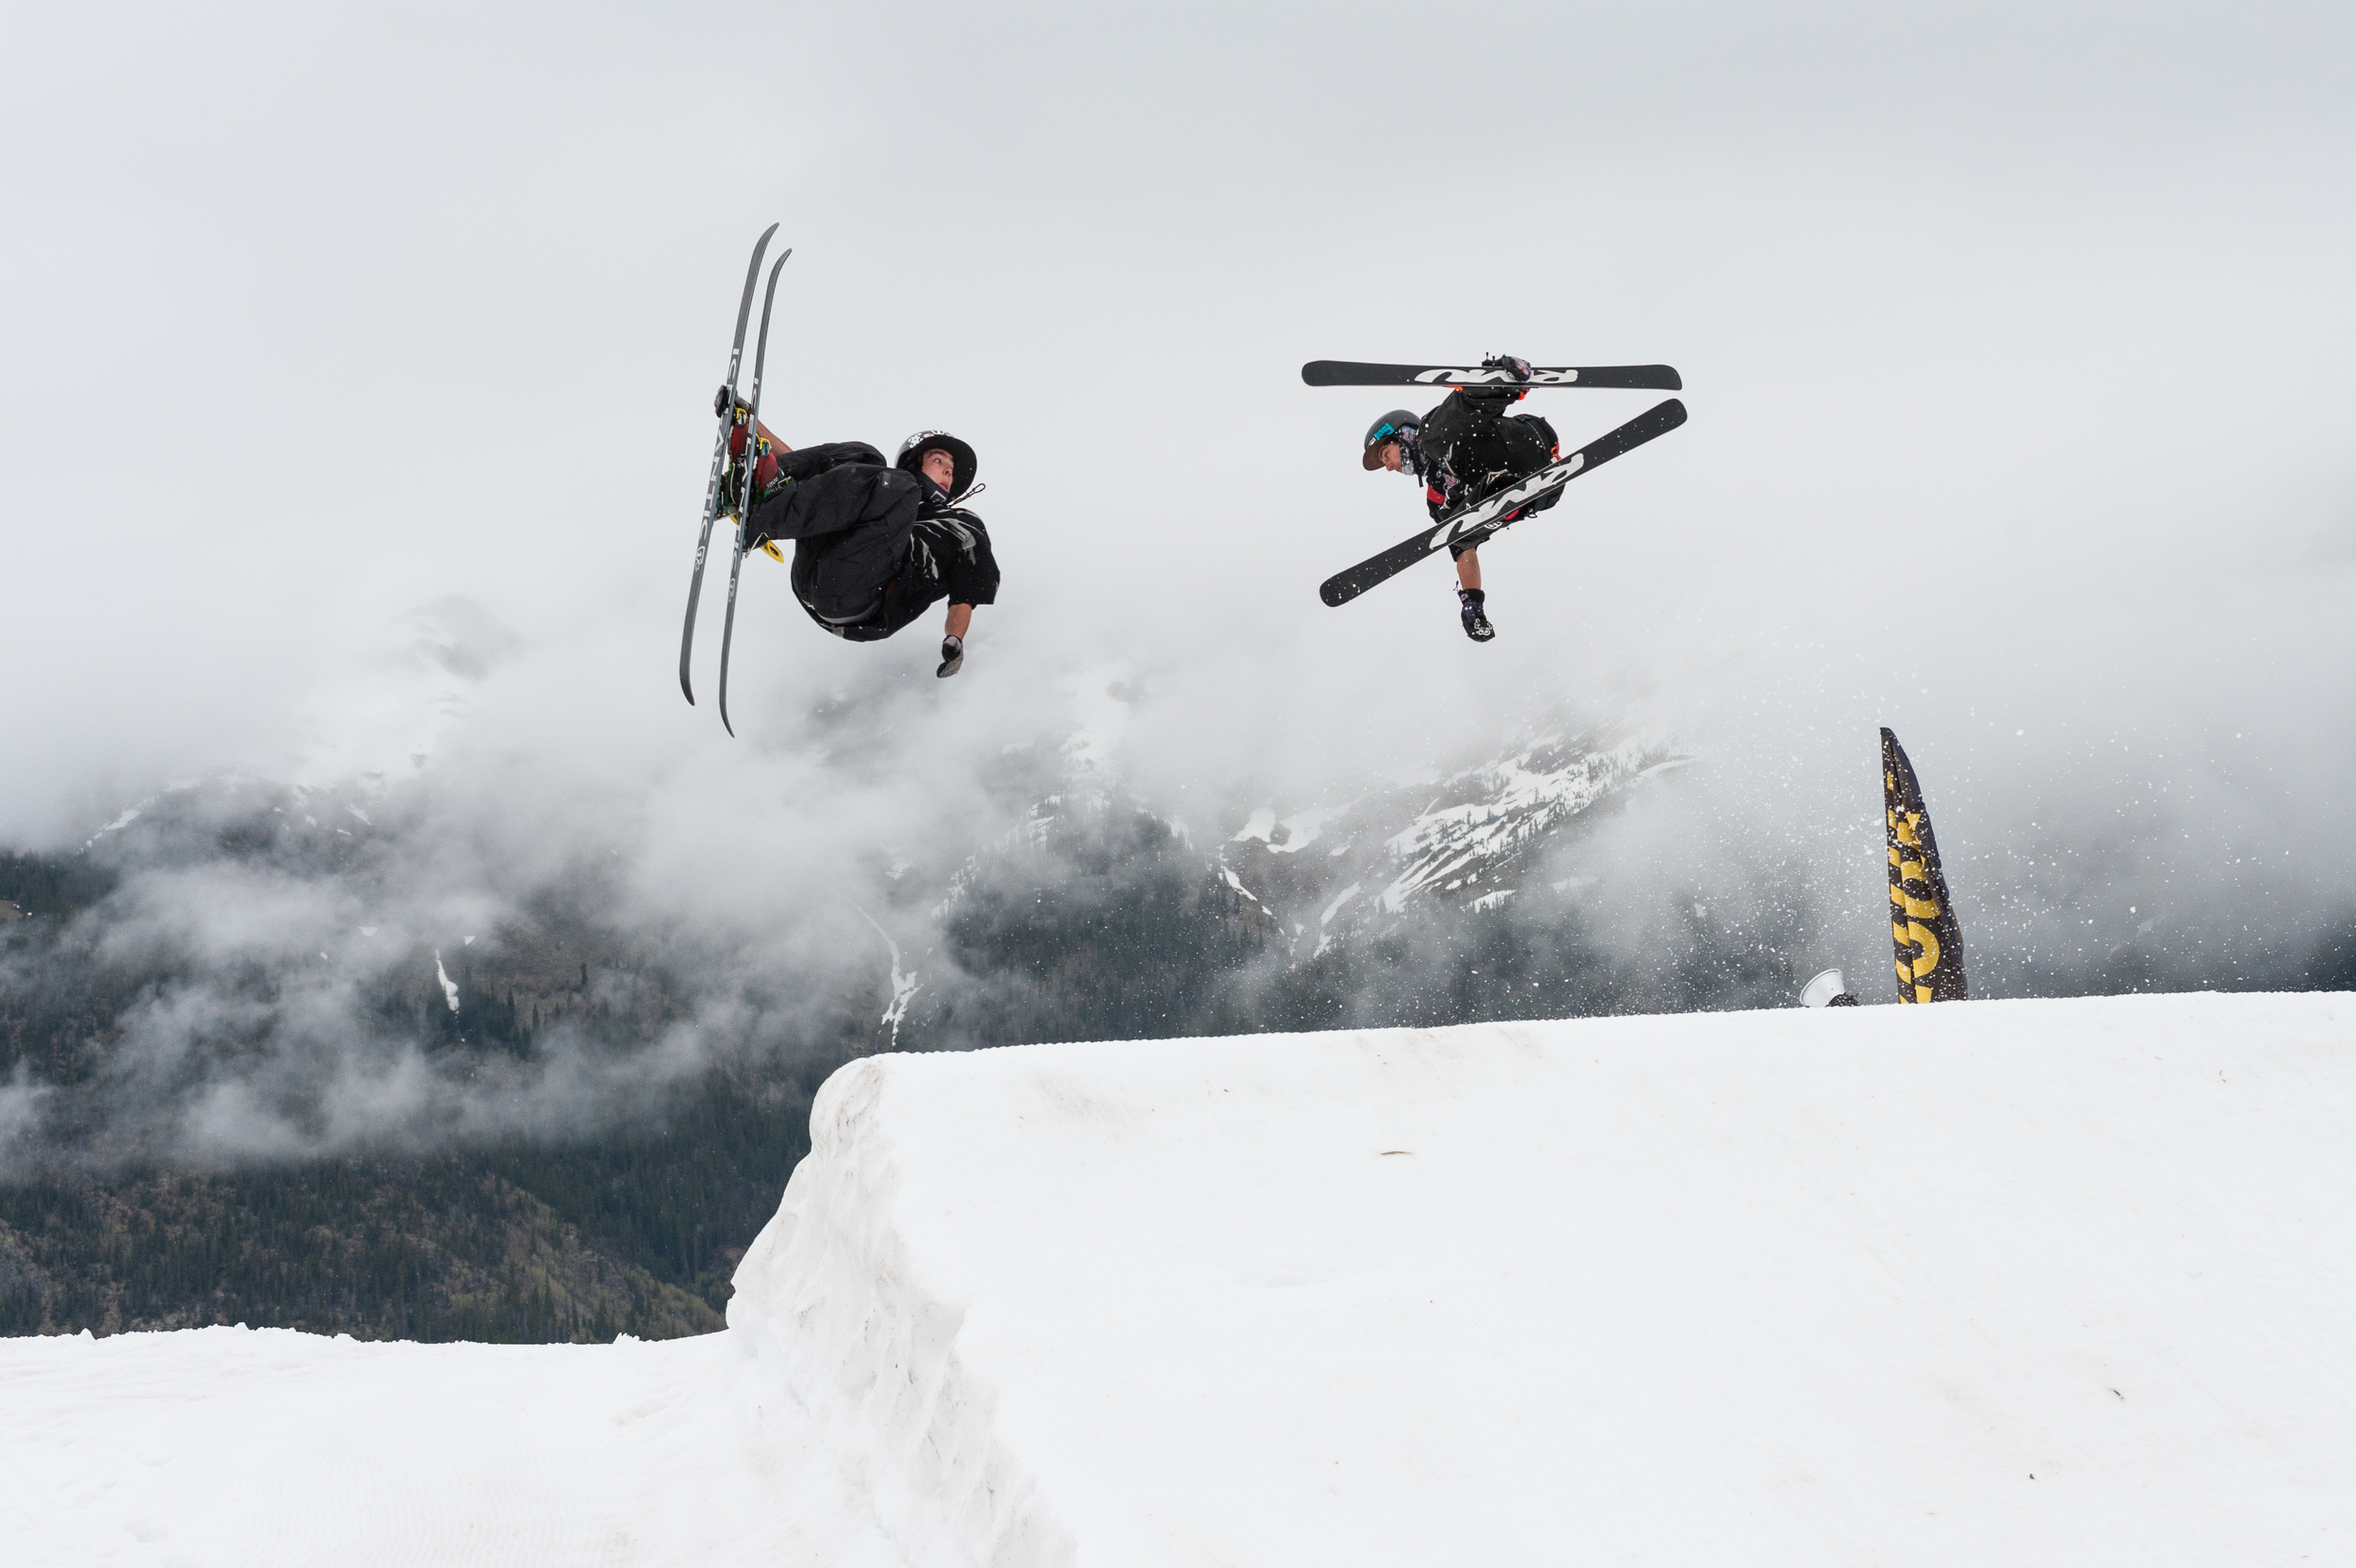 W1_2015_ski_PeytonPeter_TwinRodeos_Central_Weaver.jpg